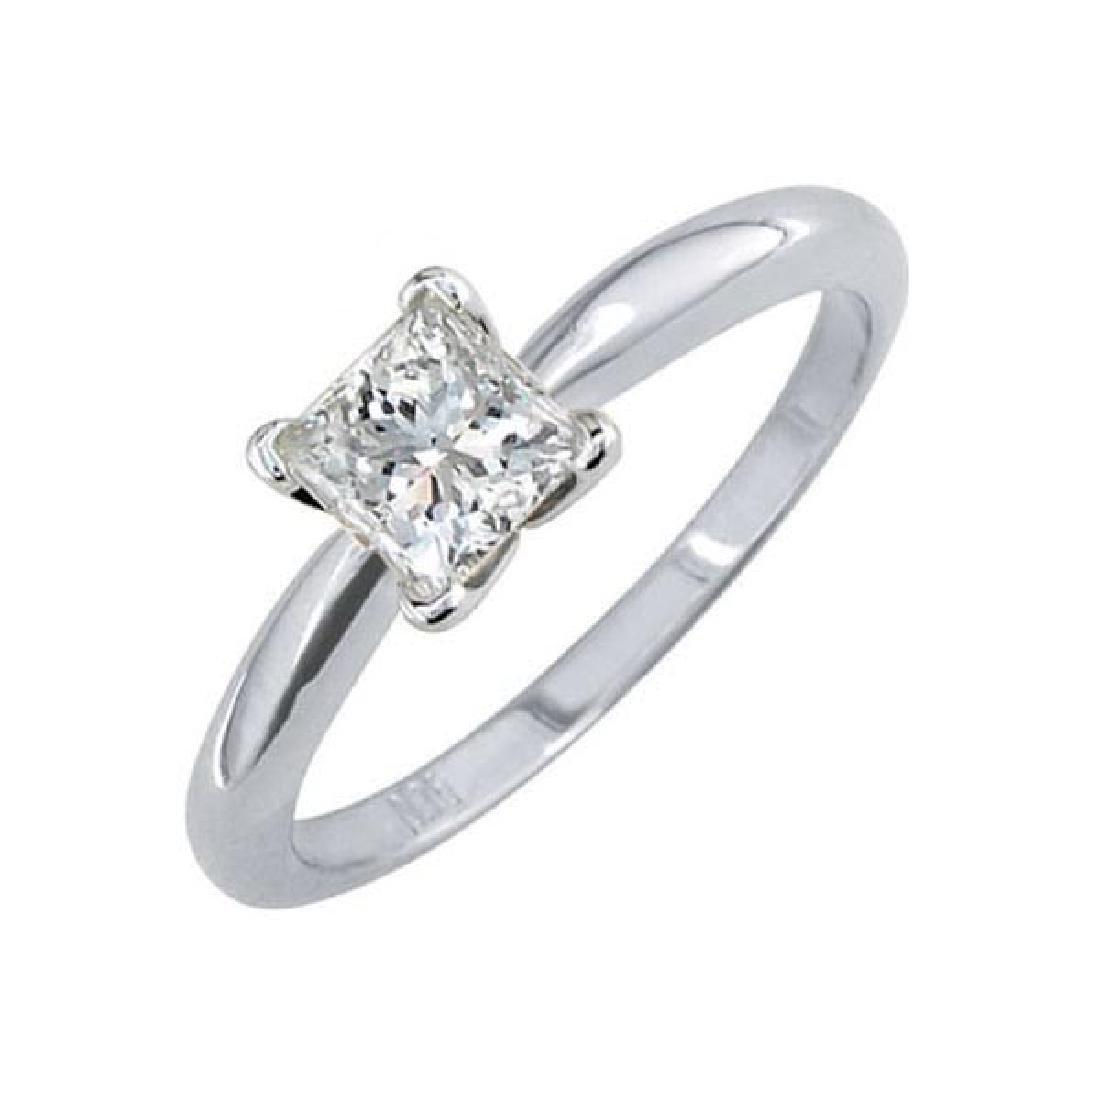 Certified 0.63 CTW Princess Diamond Solitaire 14k Ring